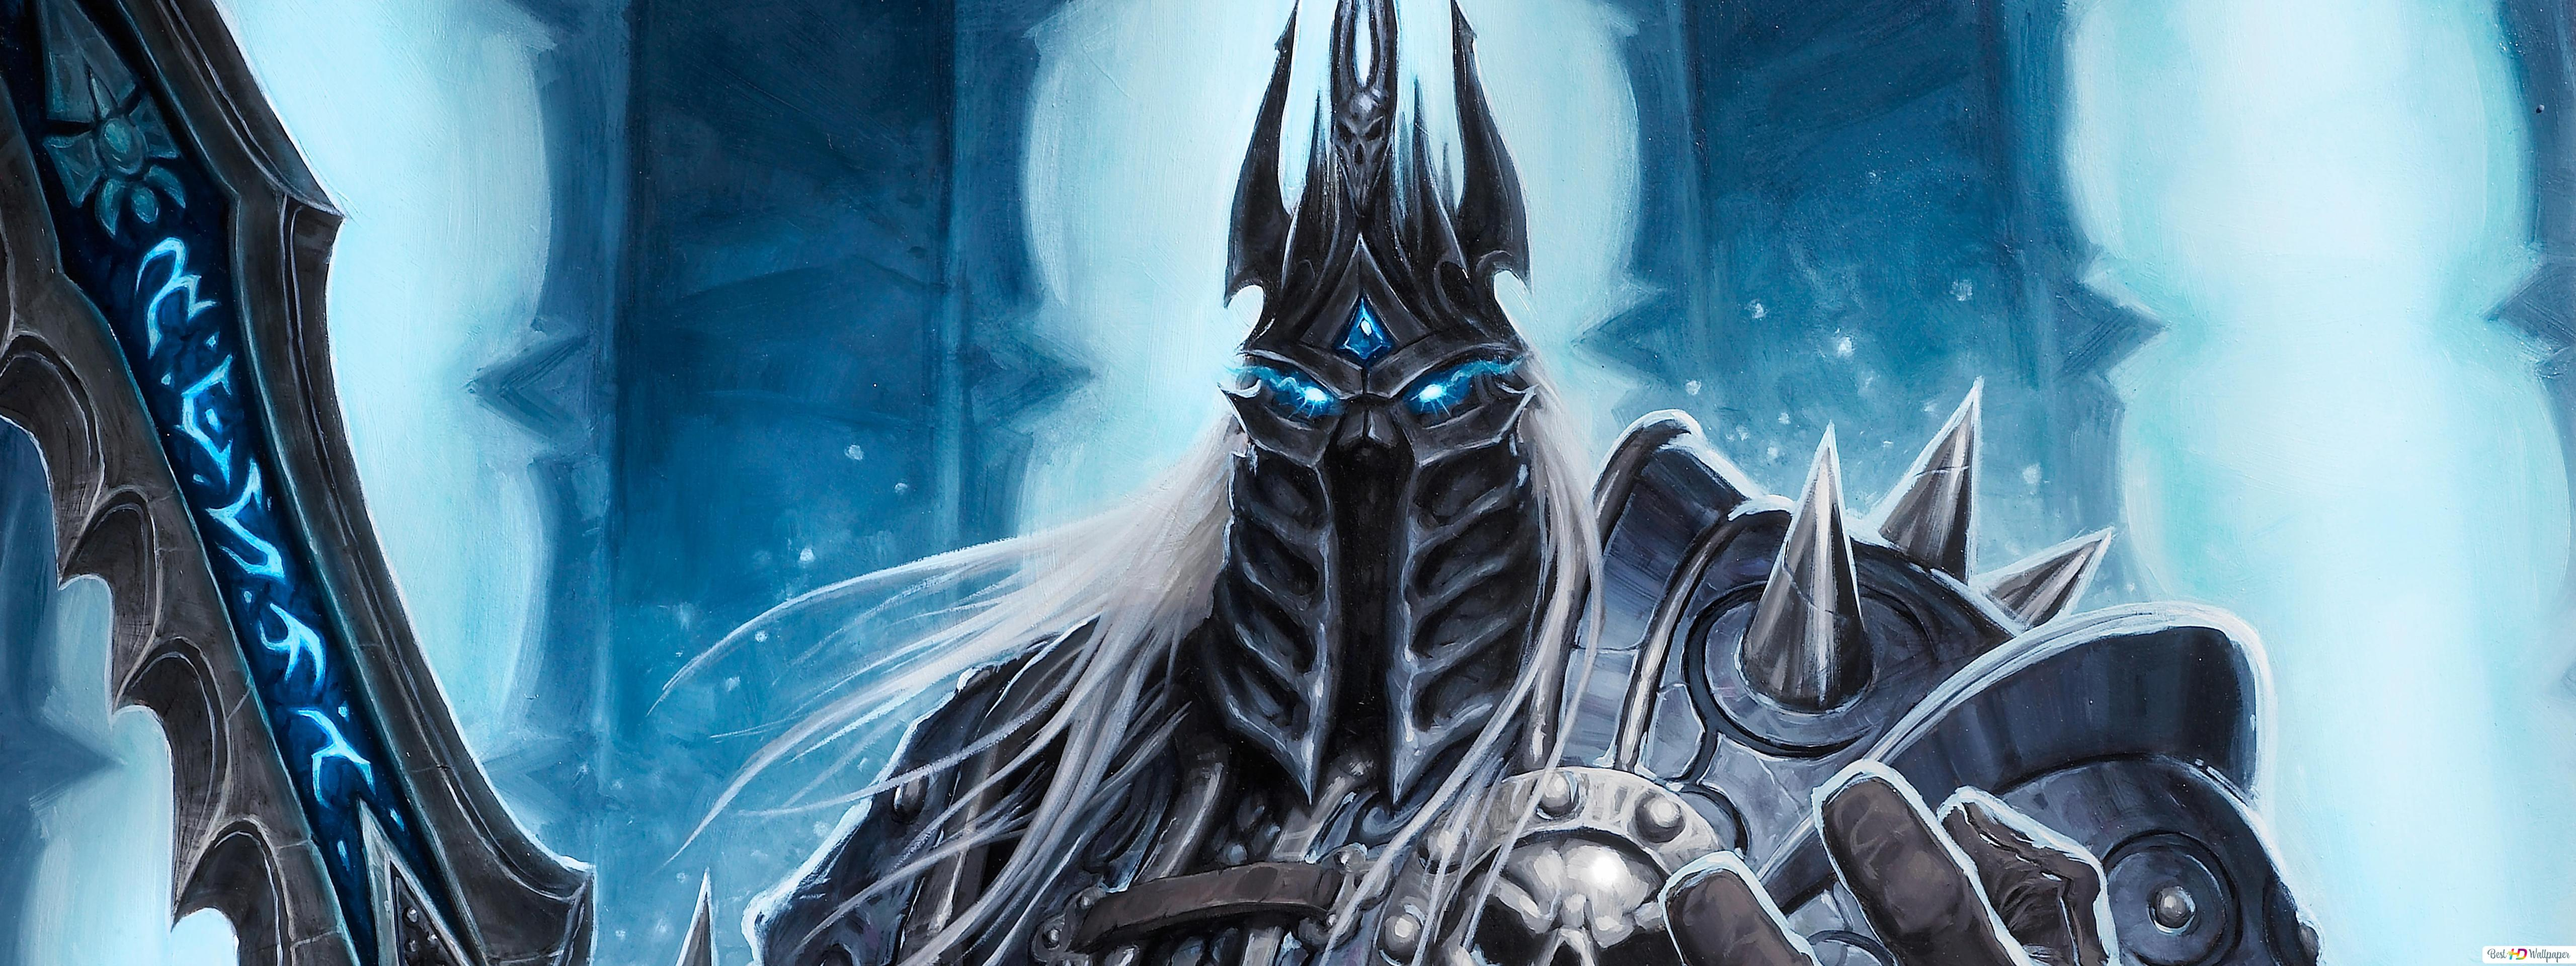 World Of Warcraft Lich King Hd Wallpaper Download